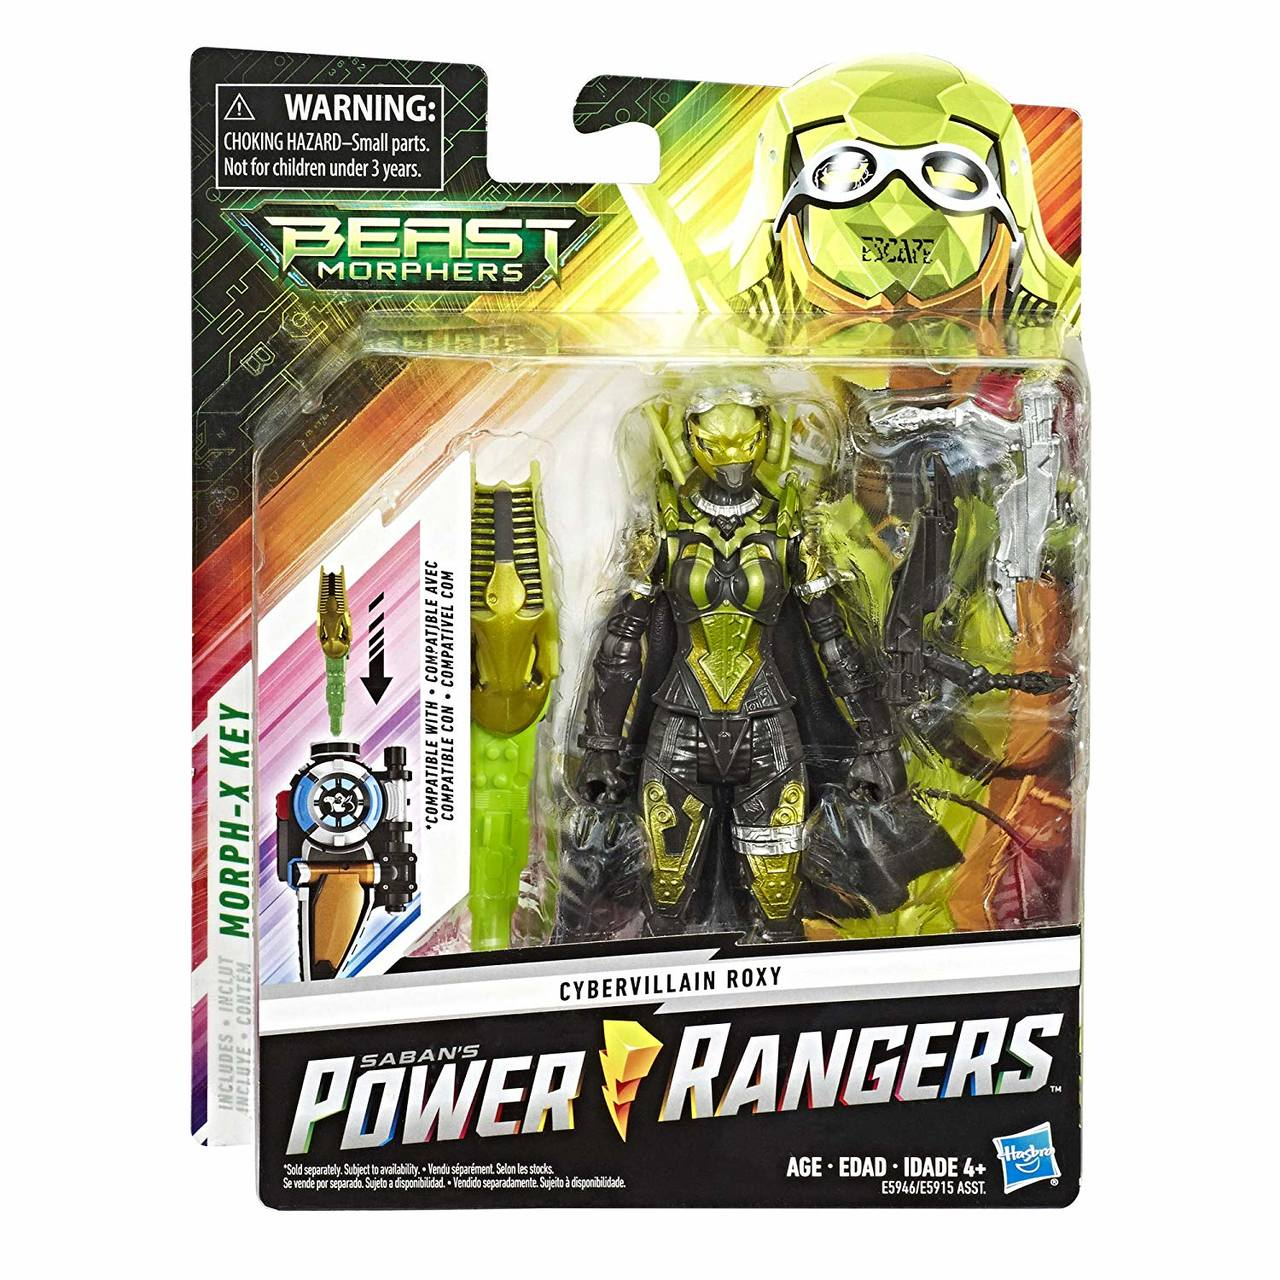 Power Rangers - Cybervillain Roxy  - Ranger - Hasbro